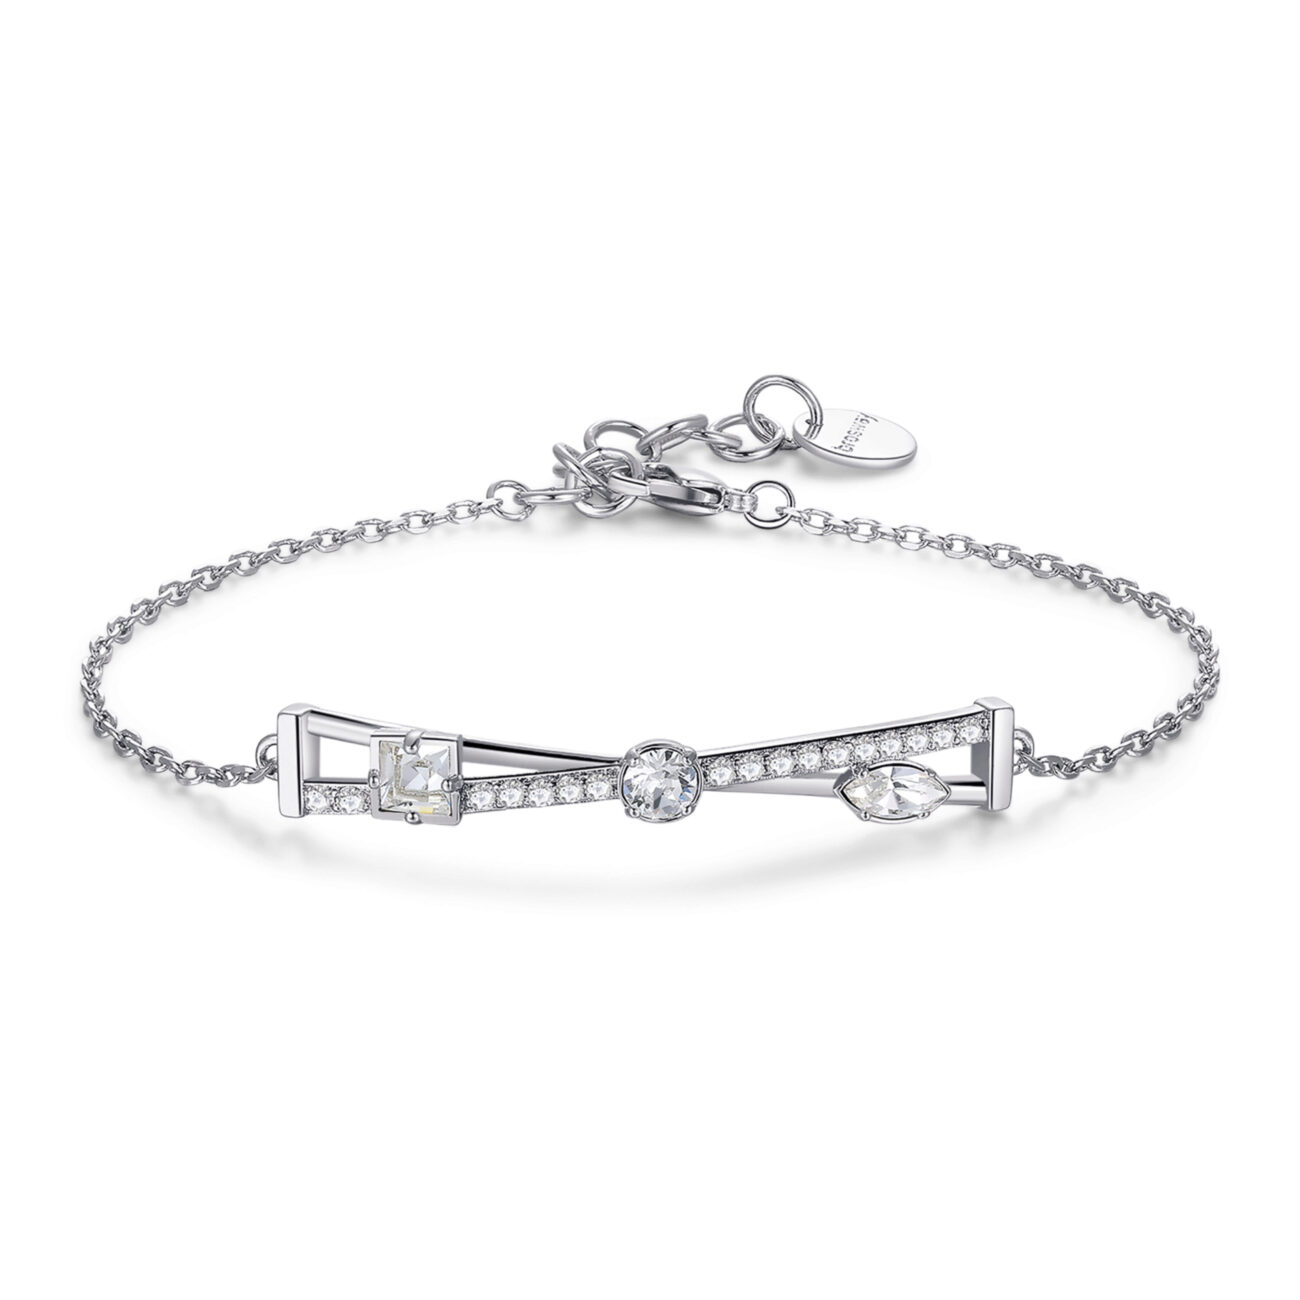 Rhodiated brass bracelet with white zircons and crystal Swarovski©crystals.